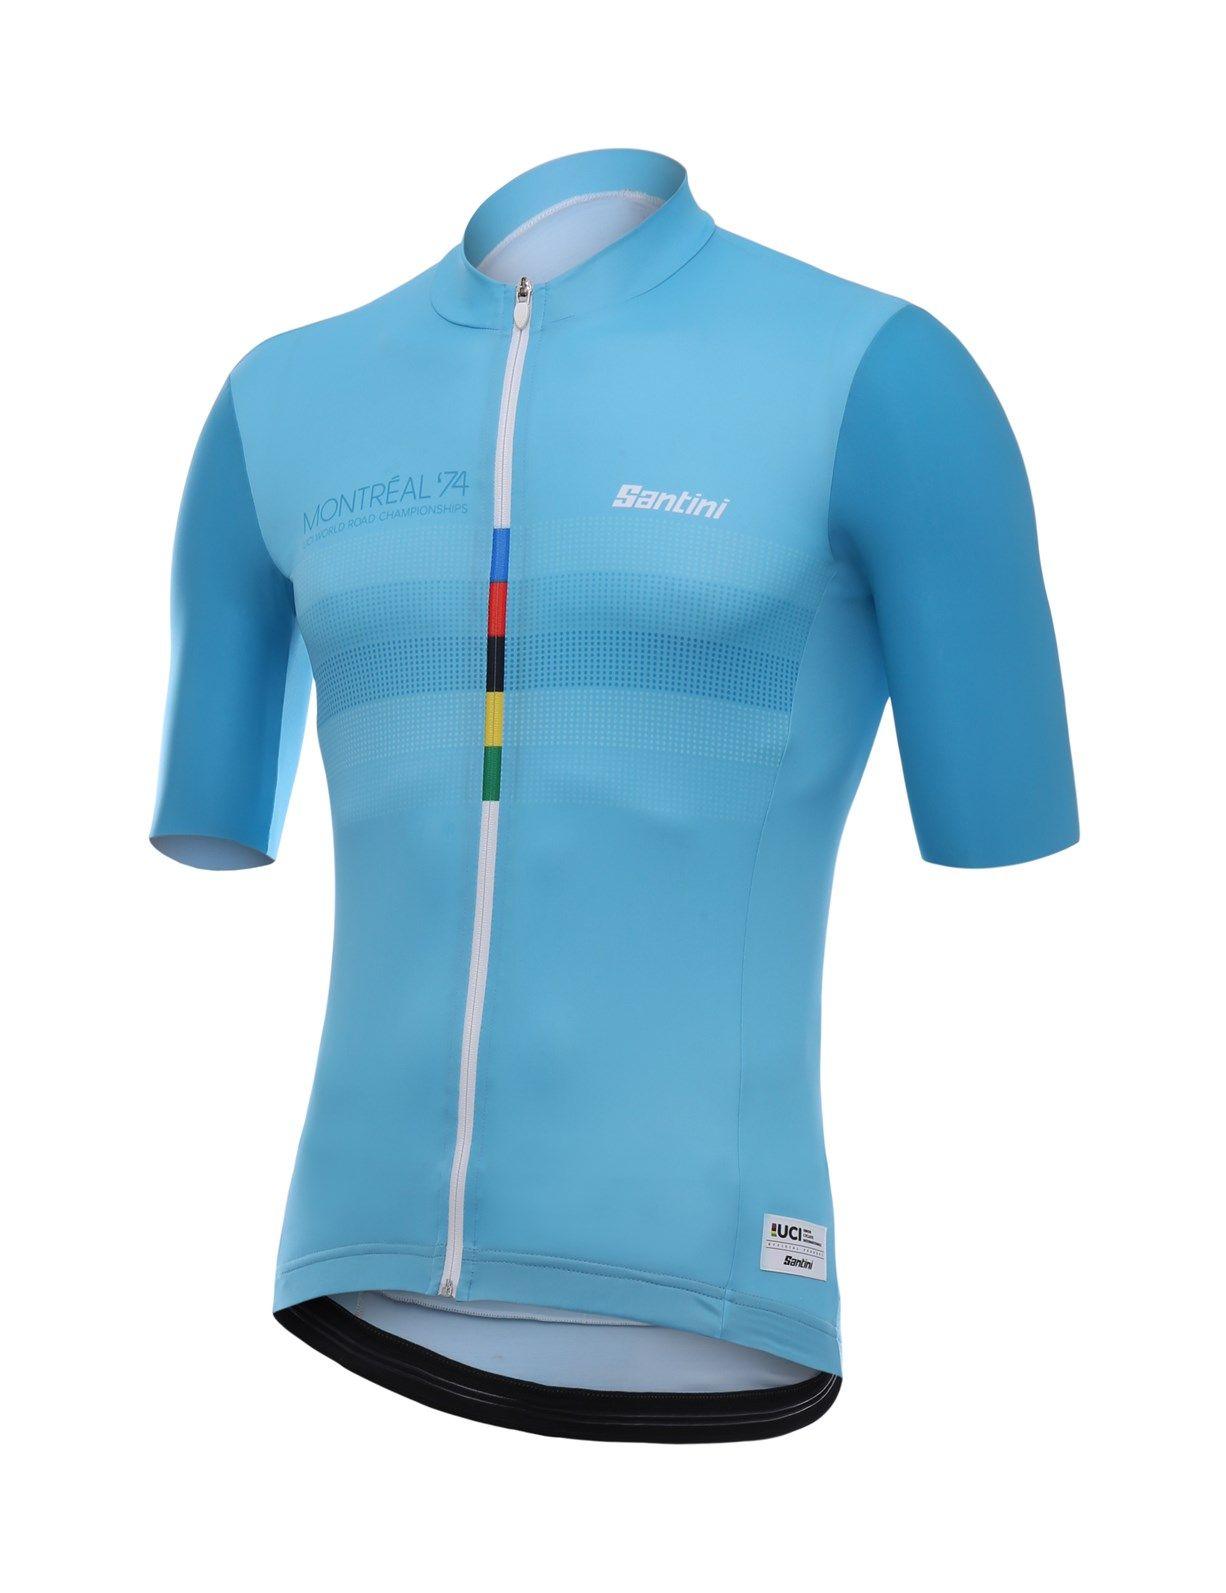 Santini UCI Grandi Campioni 1974 Eddy Merckx Short Sleeve Jersey Blue 5bcf255e9